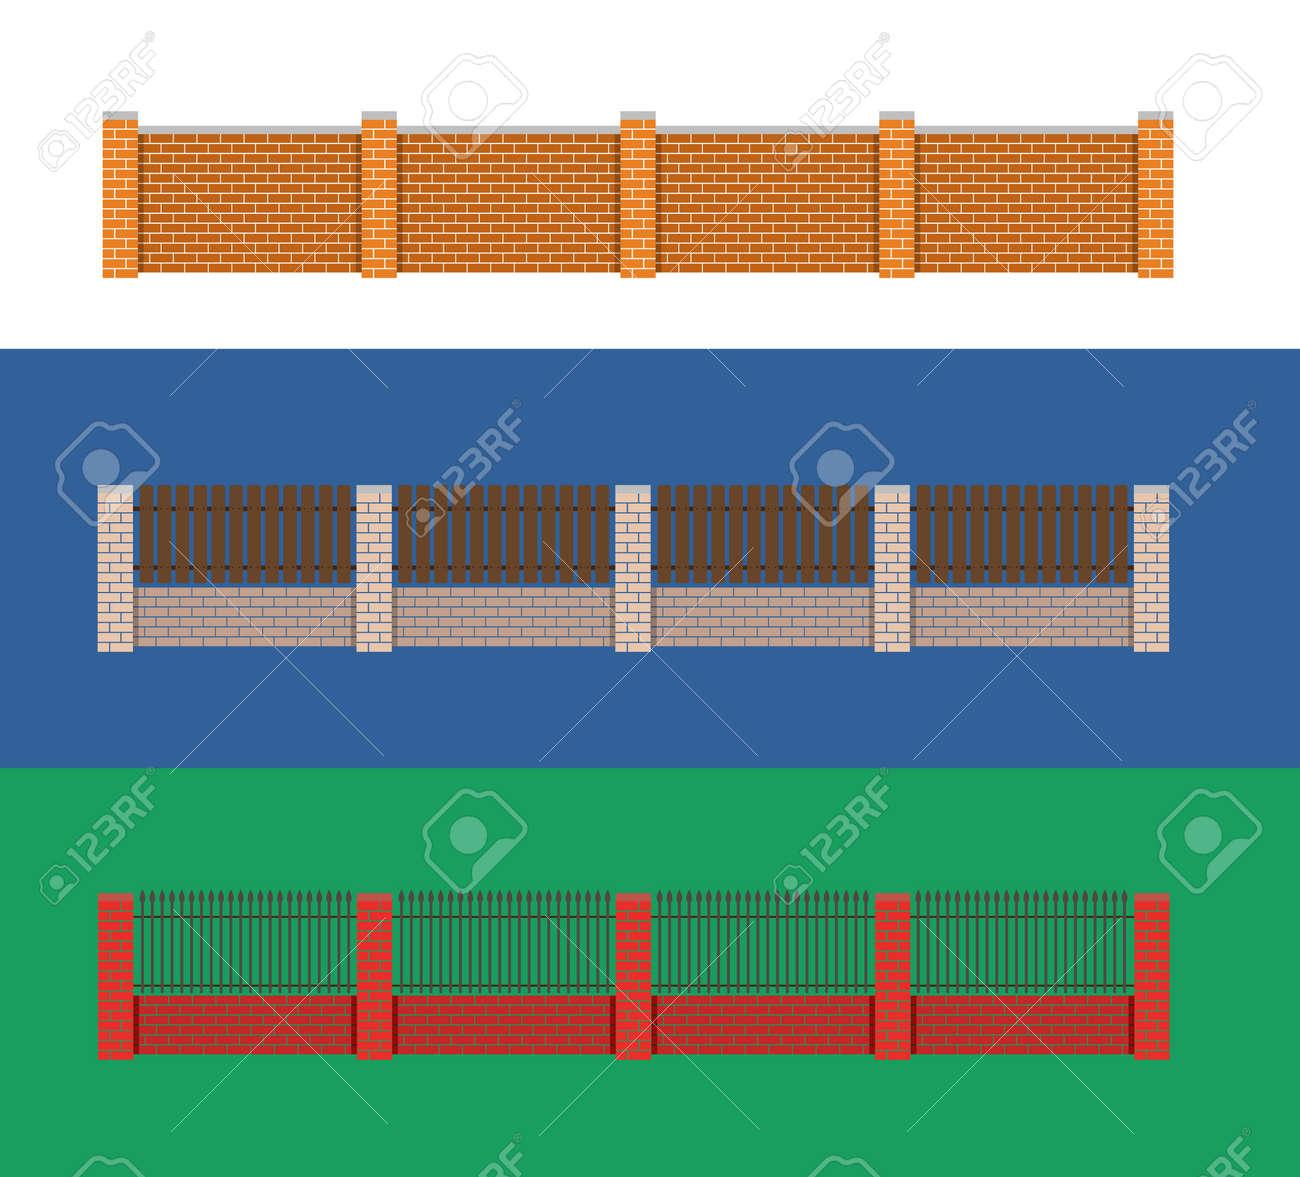 Fence vector illustration brick fence and wood fence fence fence vector illustration brick fence and wood fence fence around the house vector design baanklon Choice Image